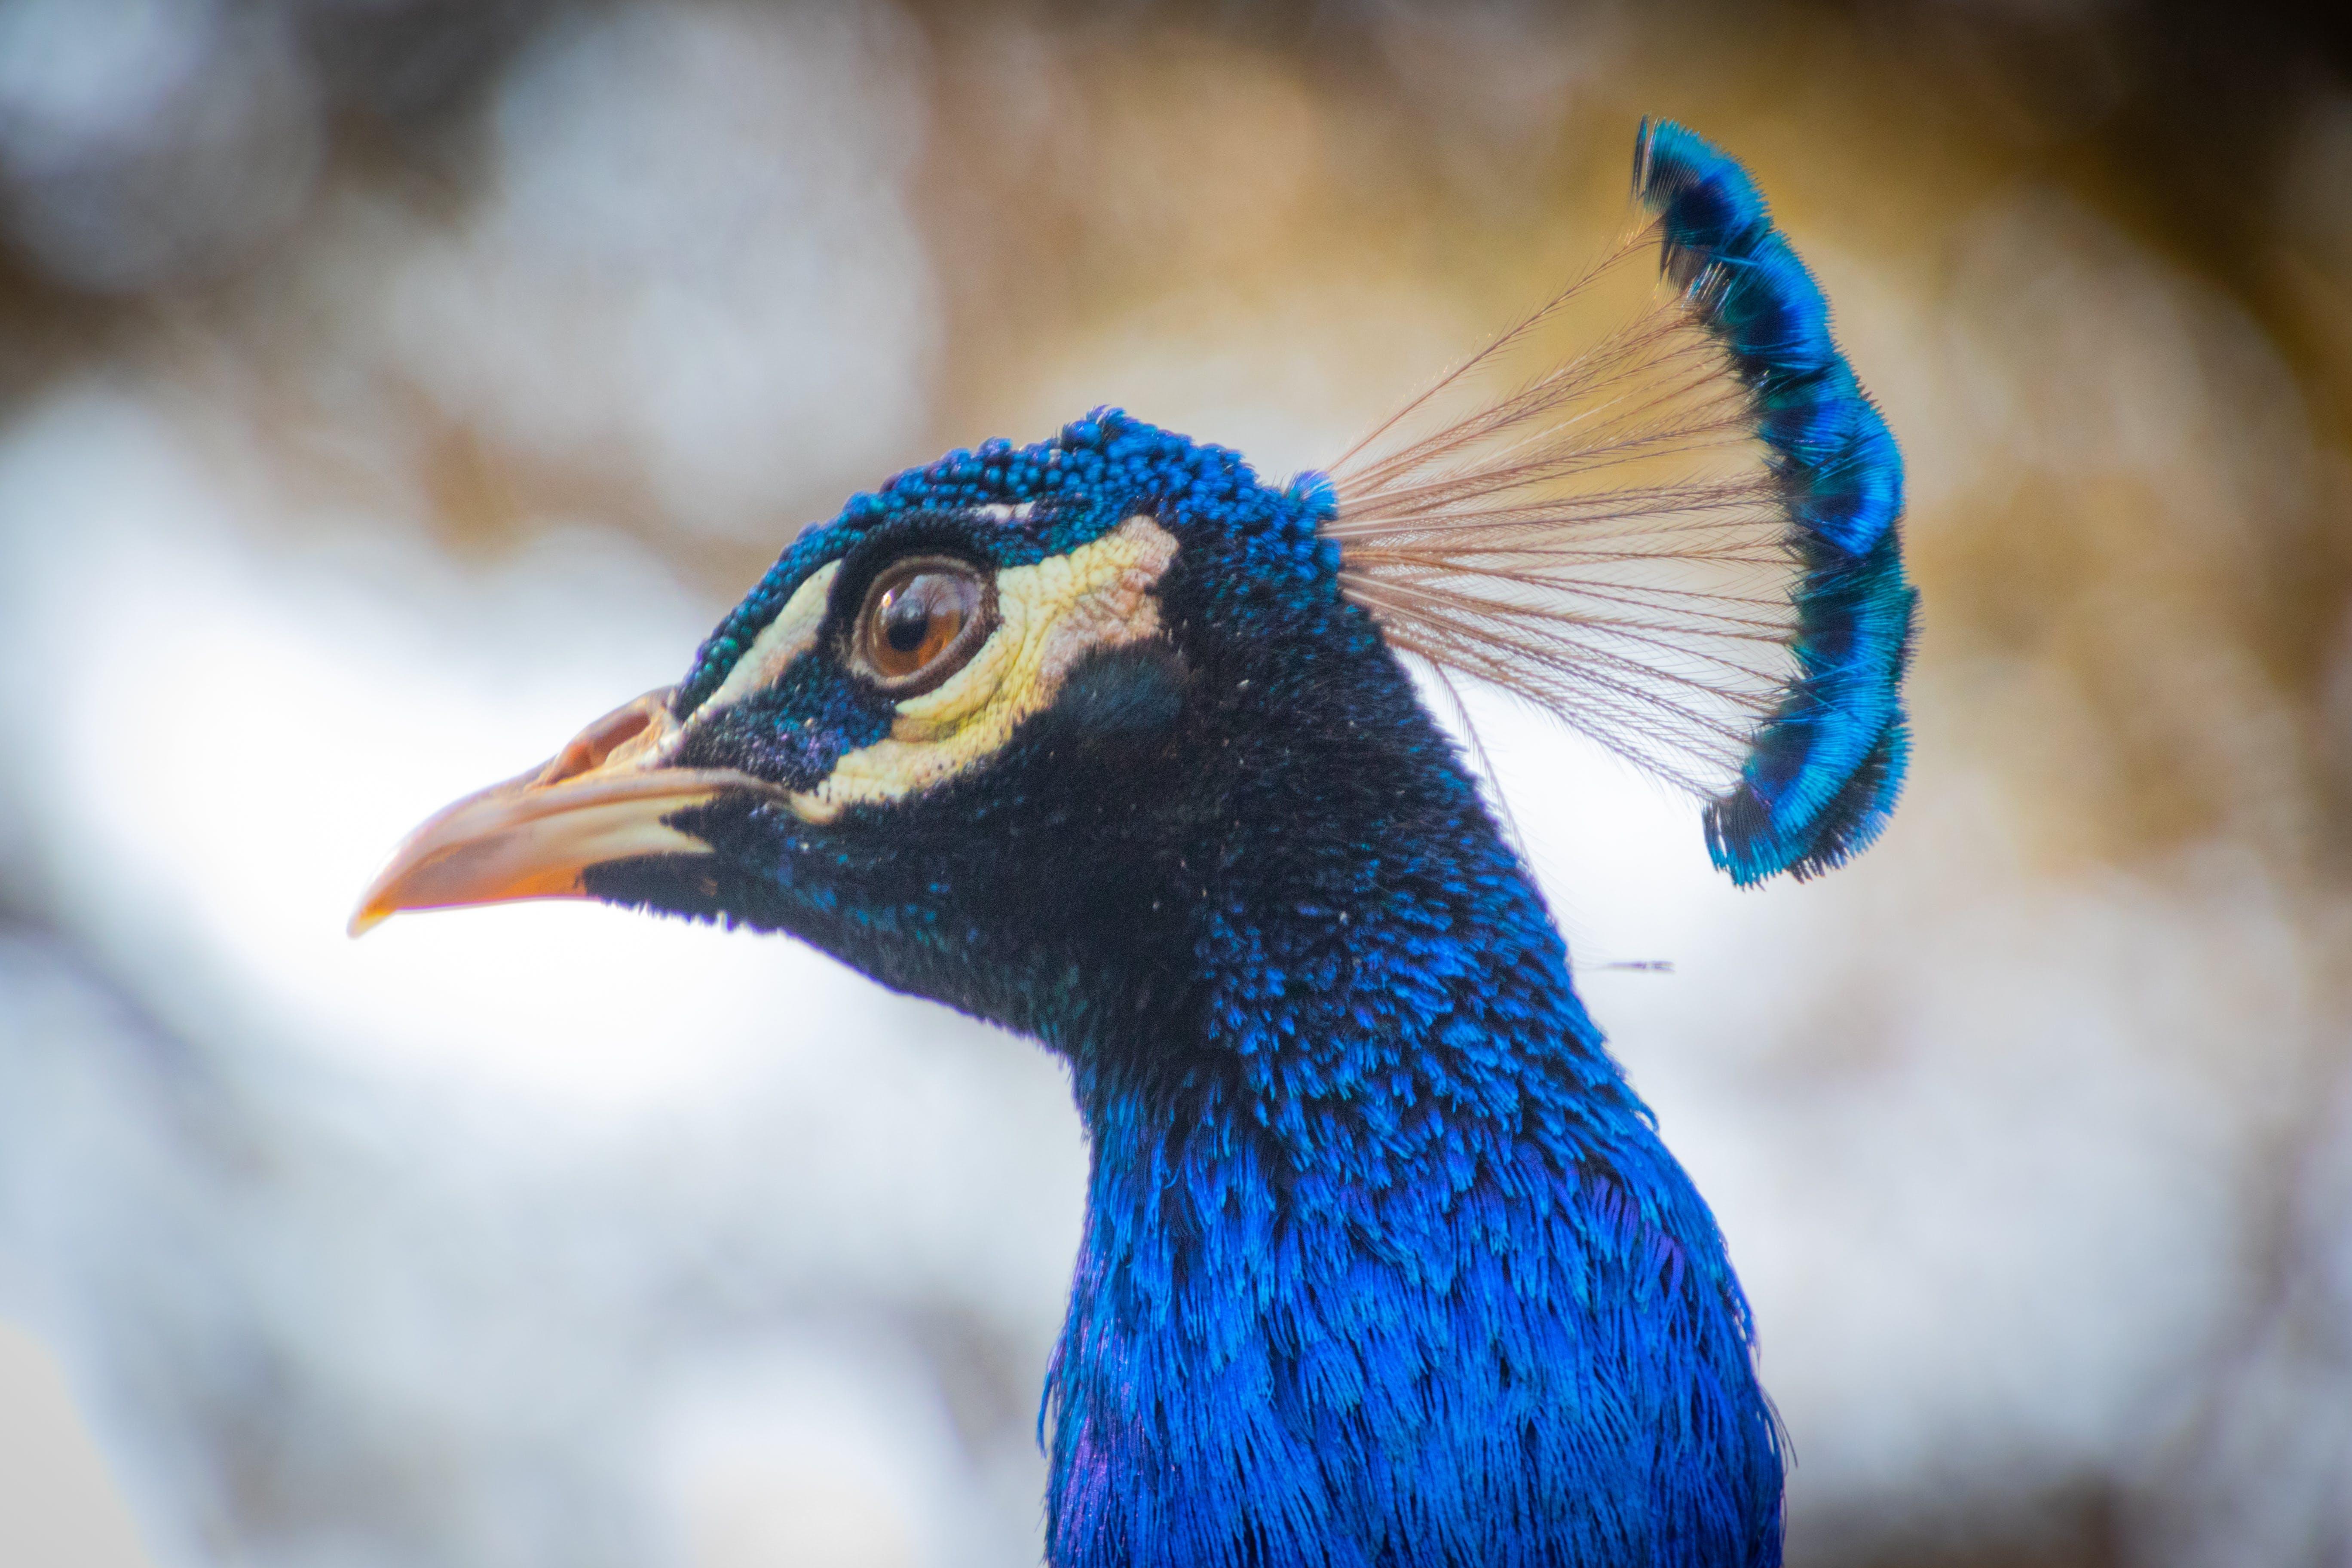 Focus Photo of Blue Peacock